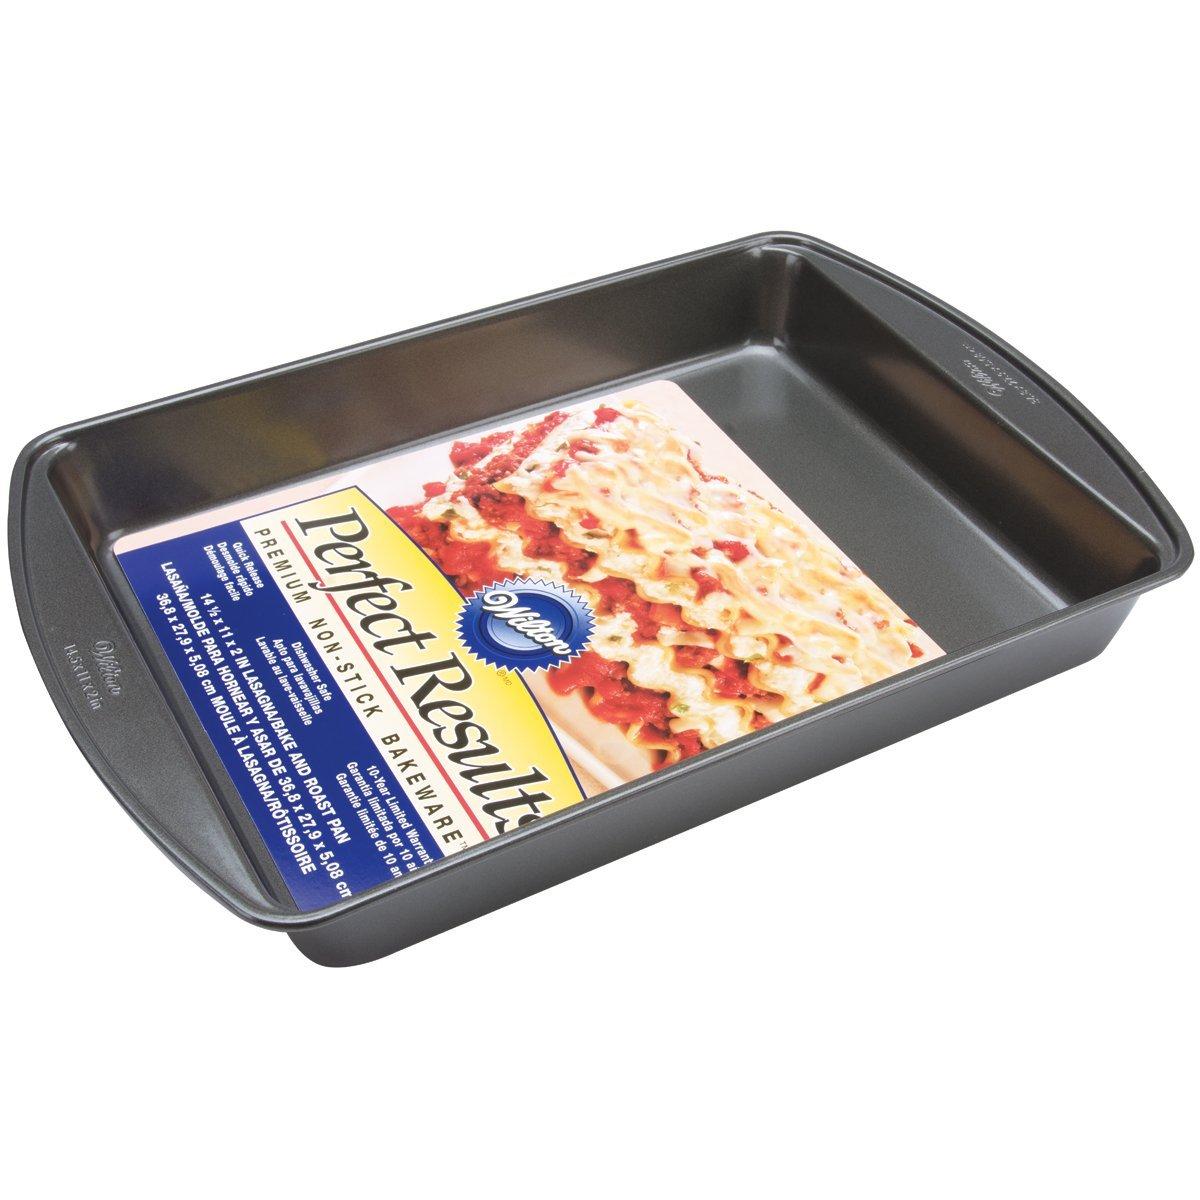 Wilton Nonstick Lasagna and Roasting Pan - 14.5-Inch 2105-6816